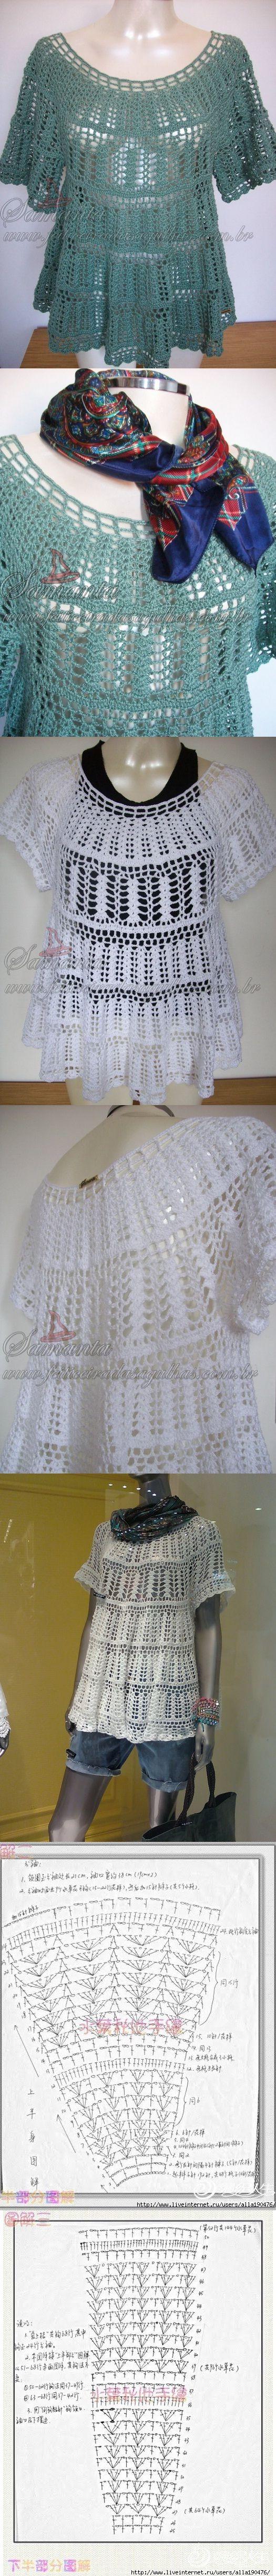 #Crochet tunic! perfect! (diagrams) crochet jacket #2dayslook #crochetfashionjacket www.2dayslook.com